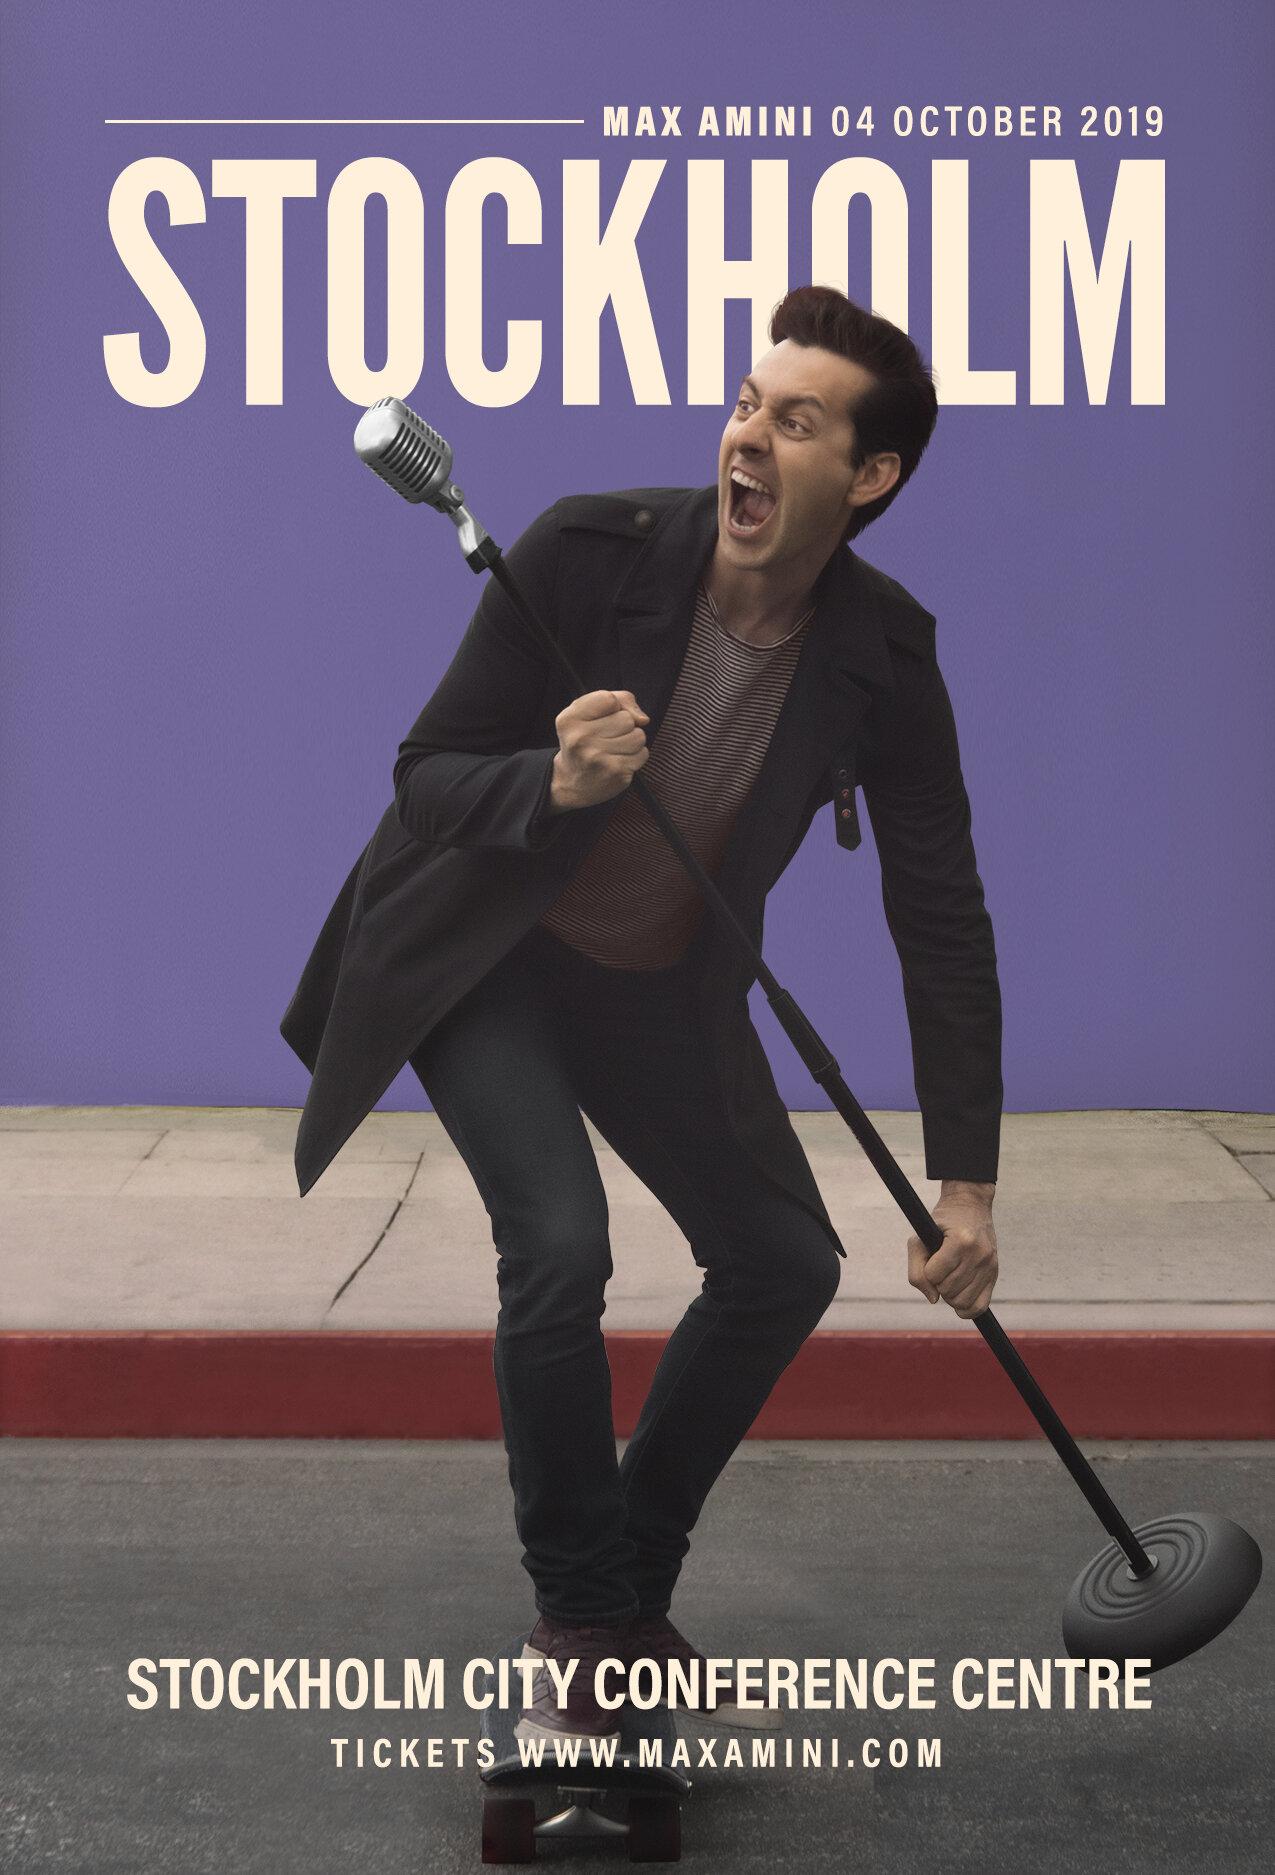 Stockholm_4x6_2.jpg